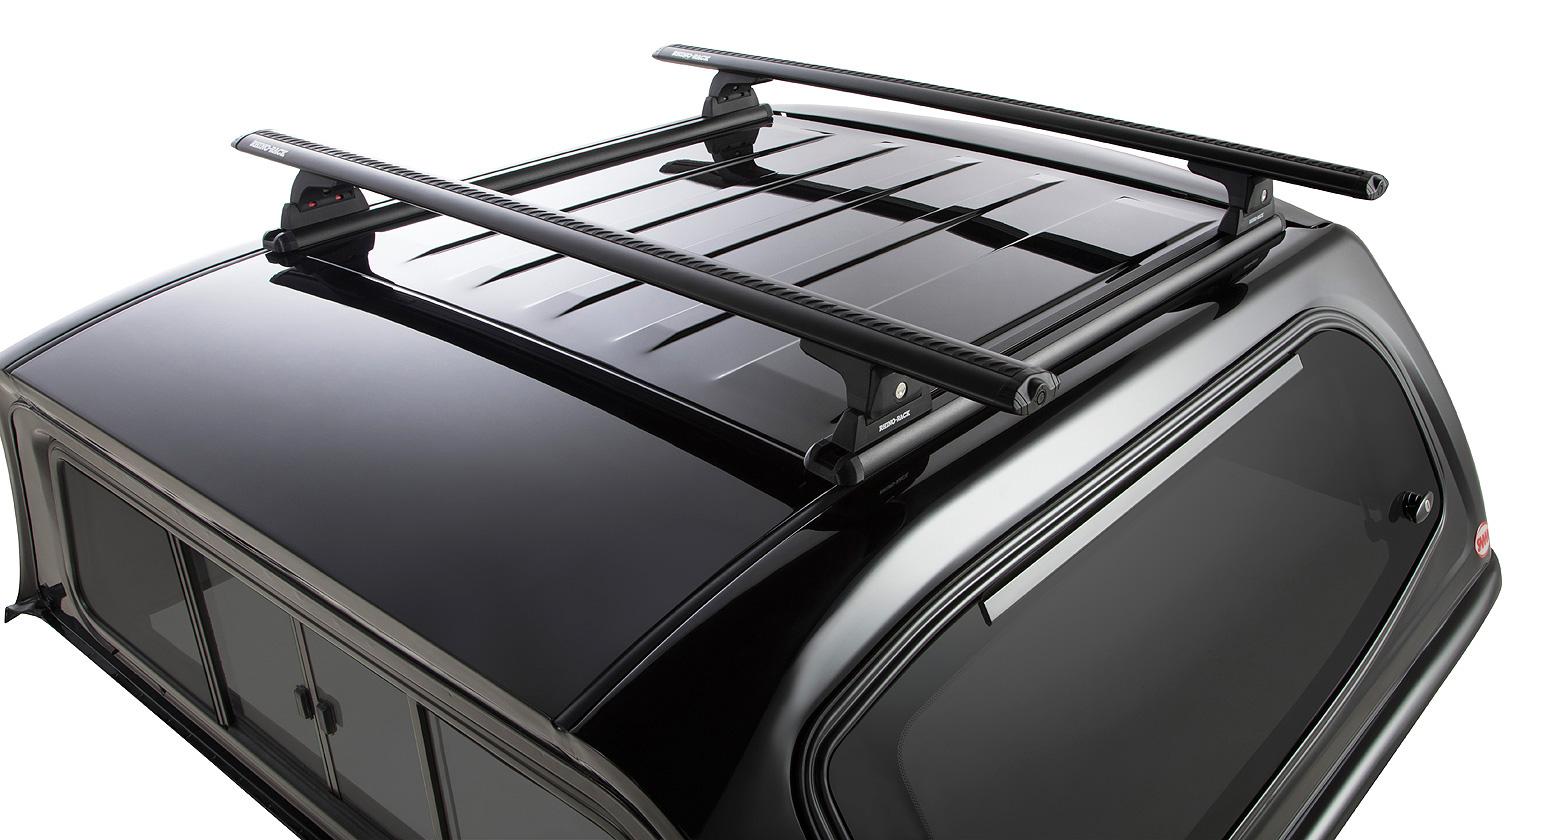 Rhino Roof Bar Fitting: Vortex RLT600 Trackmount Black 2 Bar Roof Rack